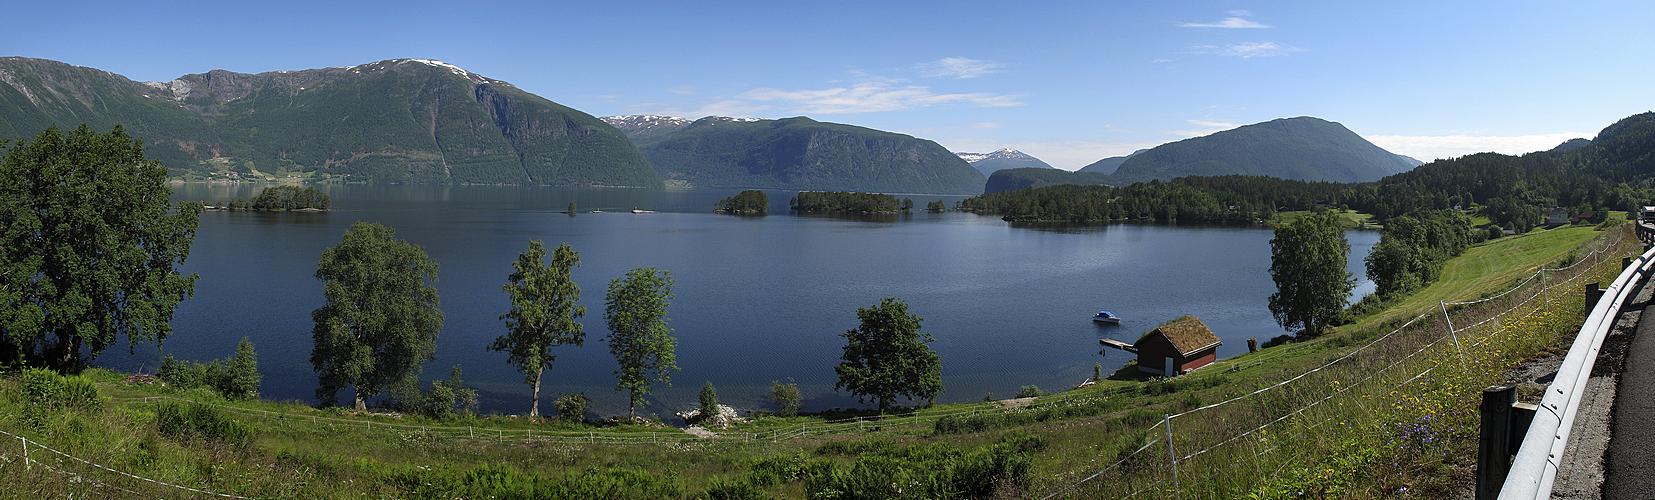 Bei Nordfjordeid